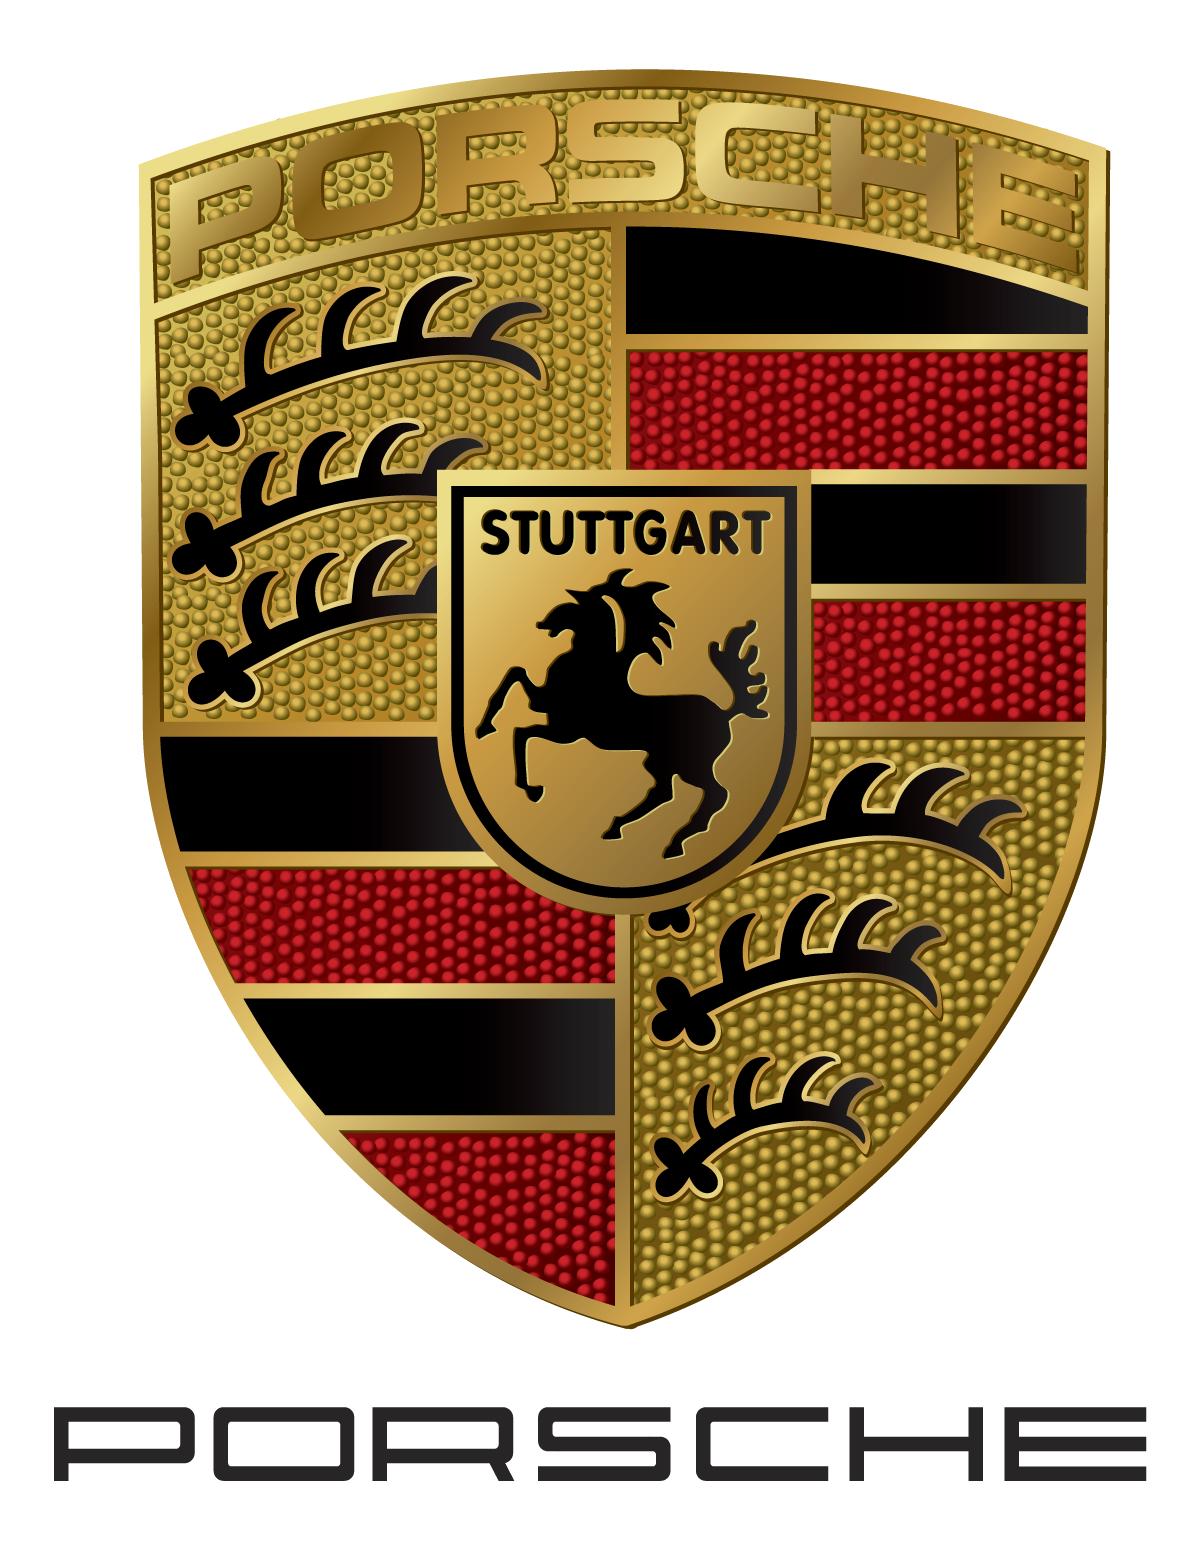 Porsche logo PNG image - Porsche PNG